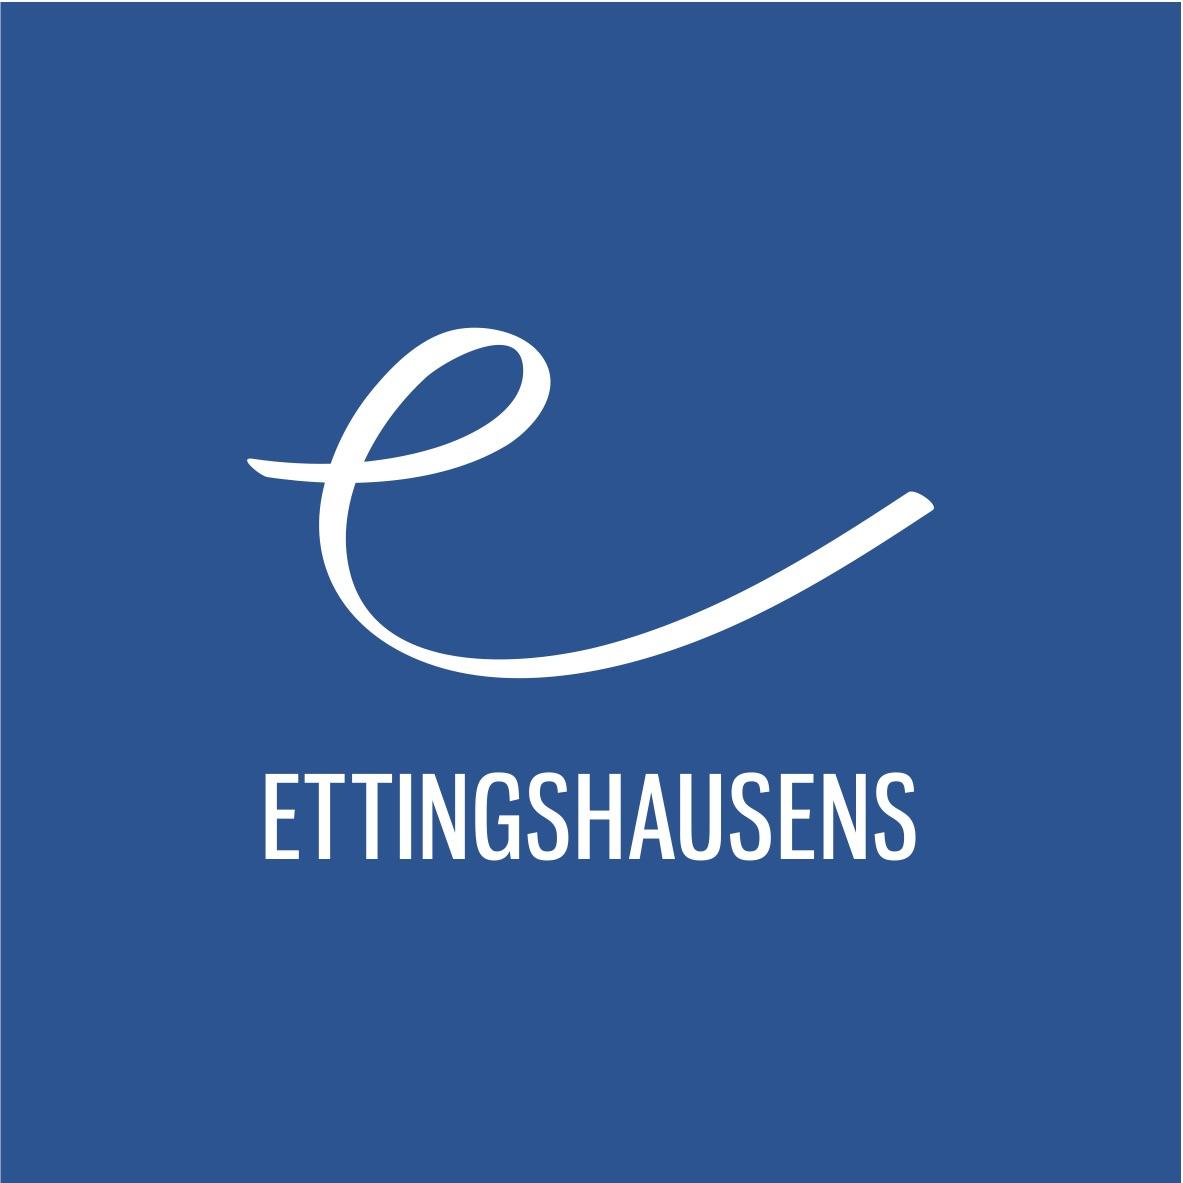 Ettingshausens Dance Theatre Martial Arts